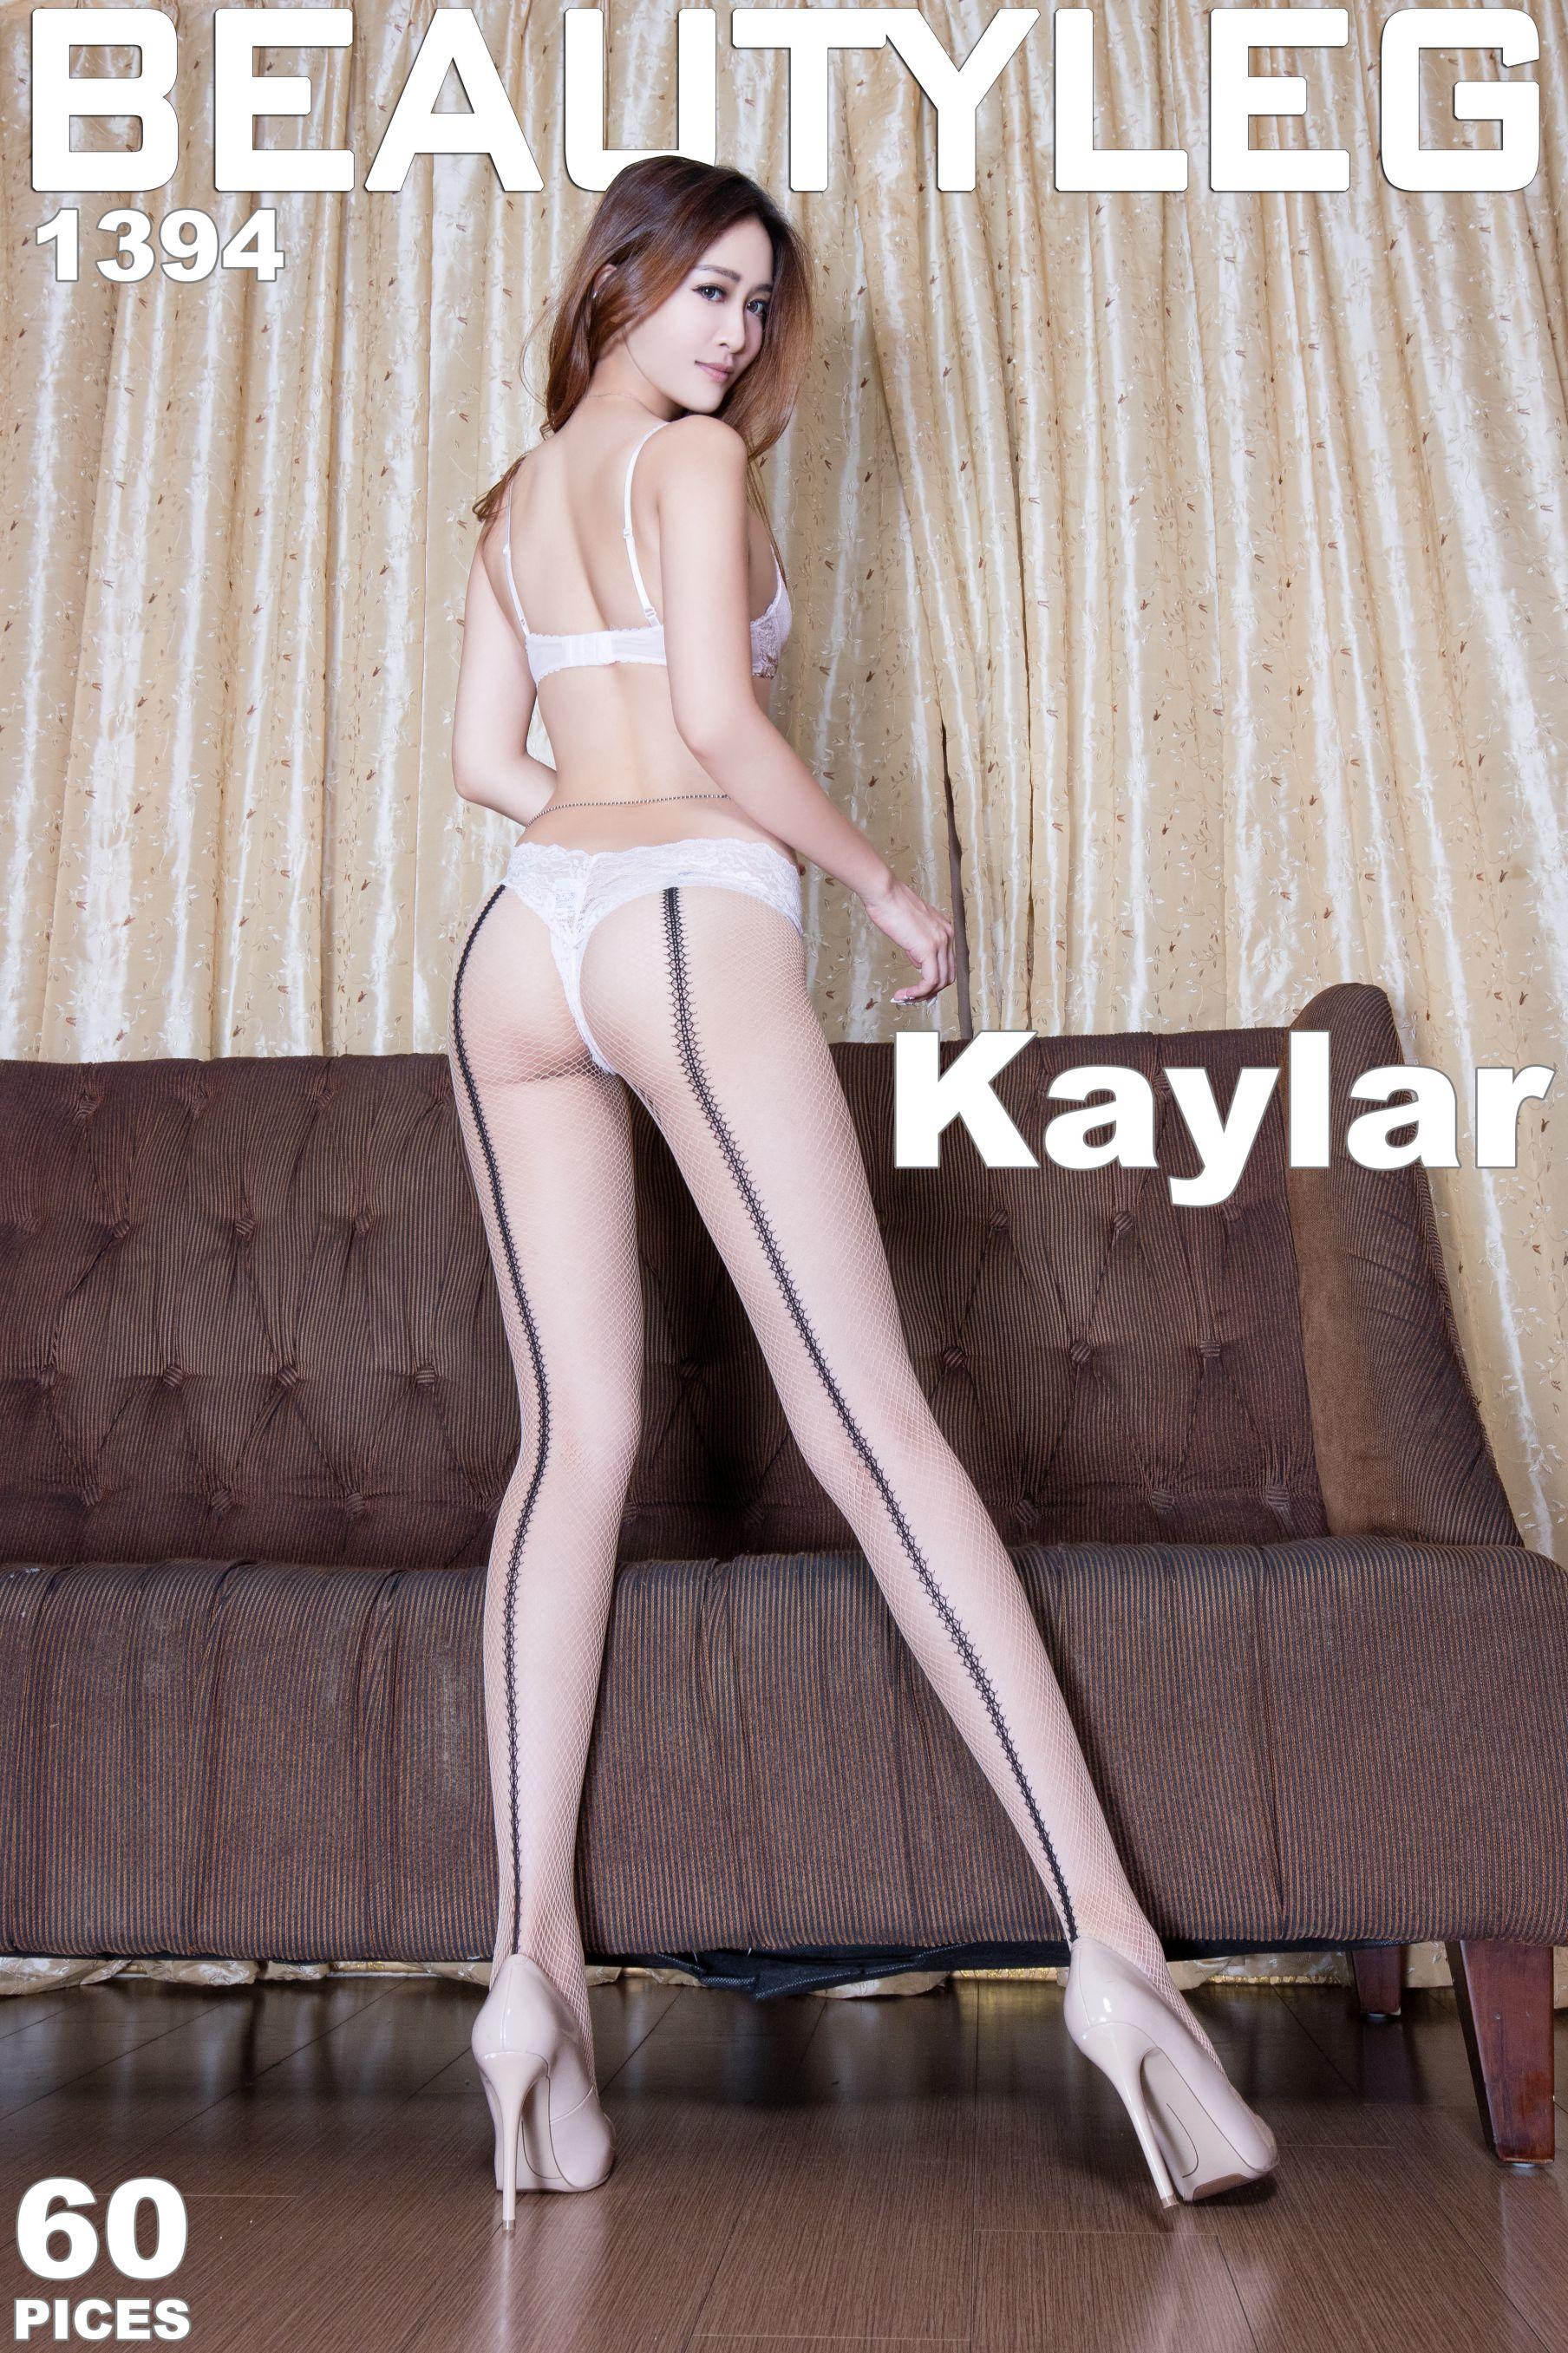 VOL.145 [Beautyleg]丝袜美腿:康凯乐(腿模Kaylar)高品质写真套图(54P)